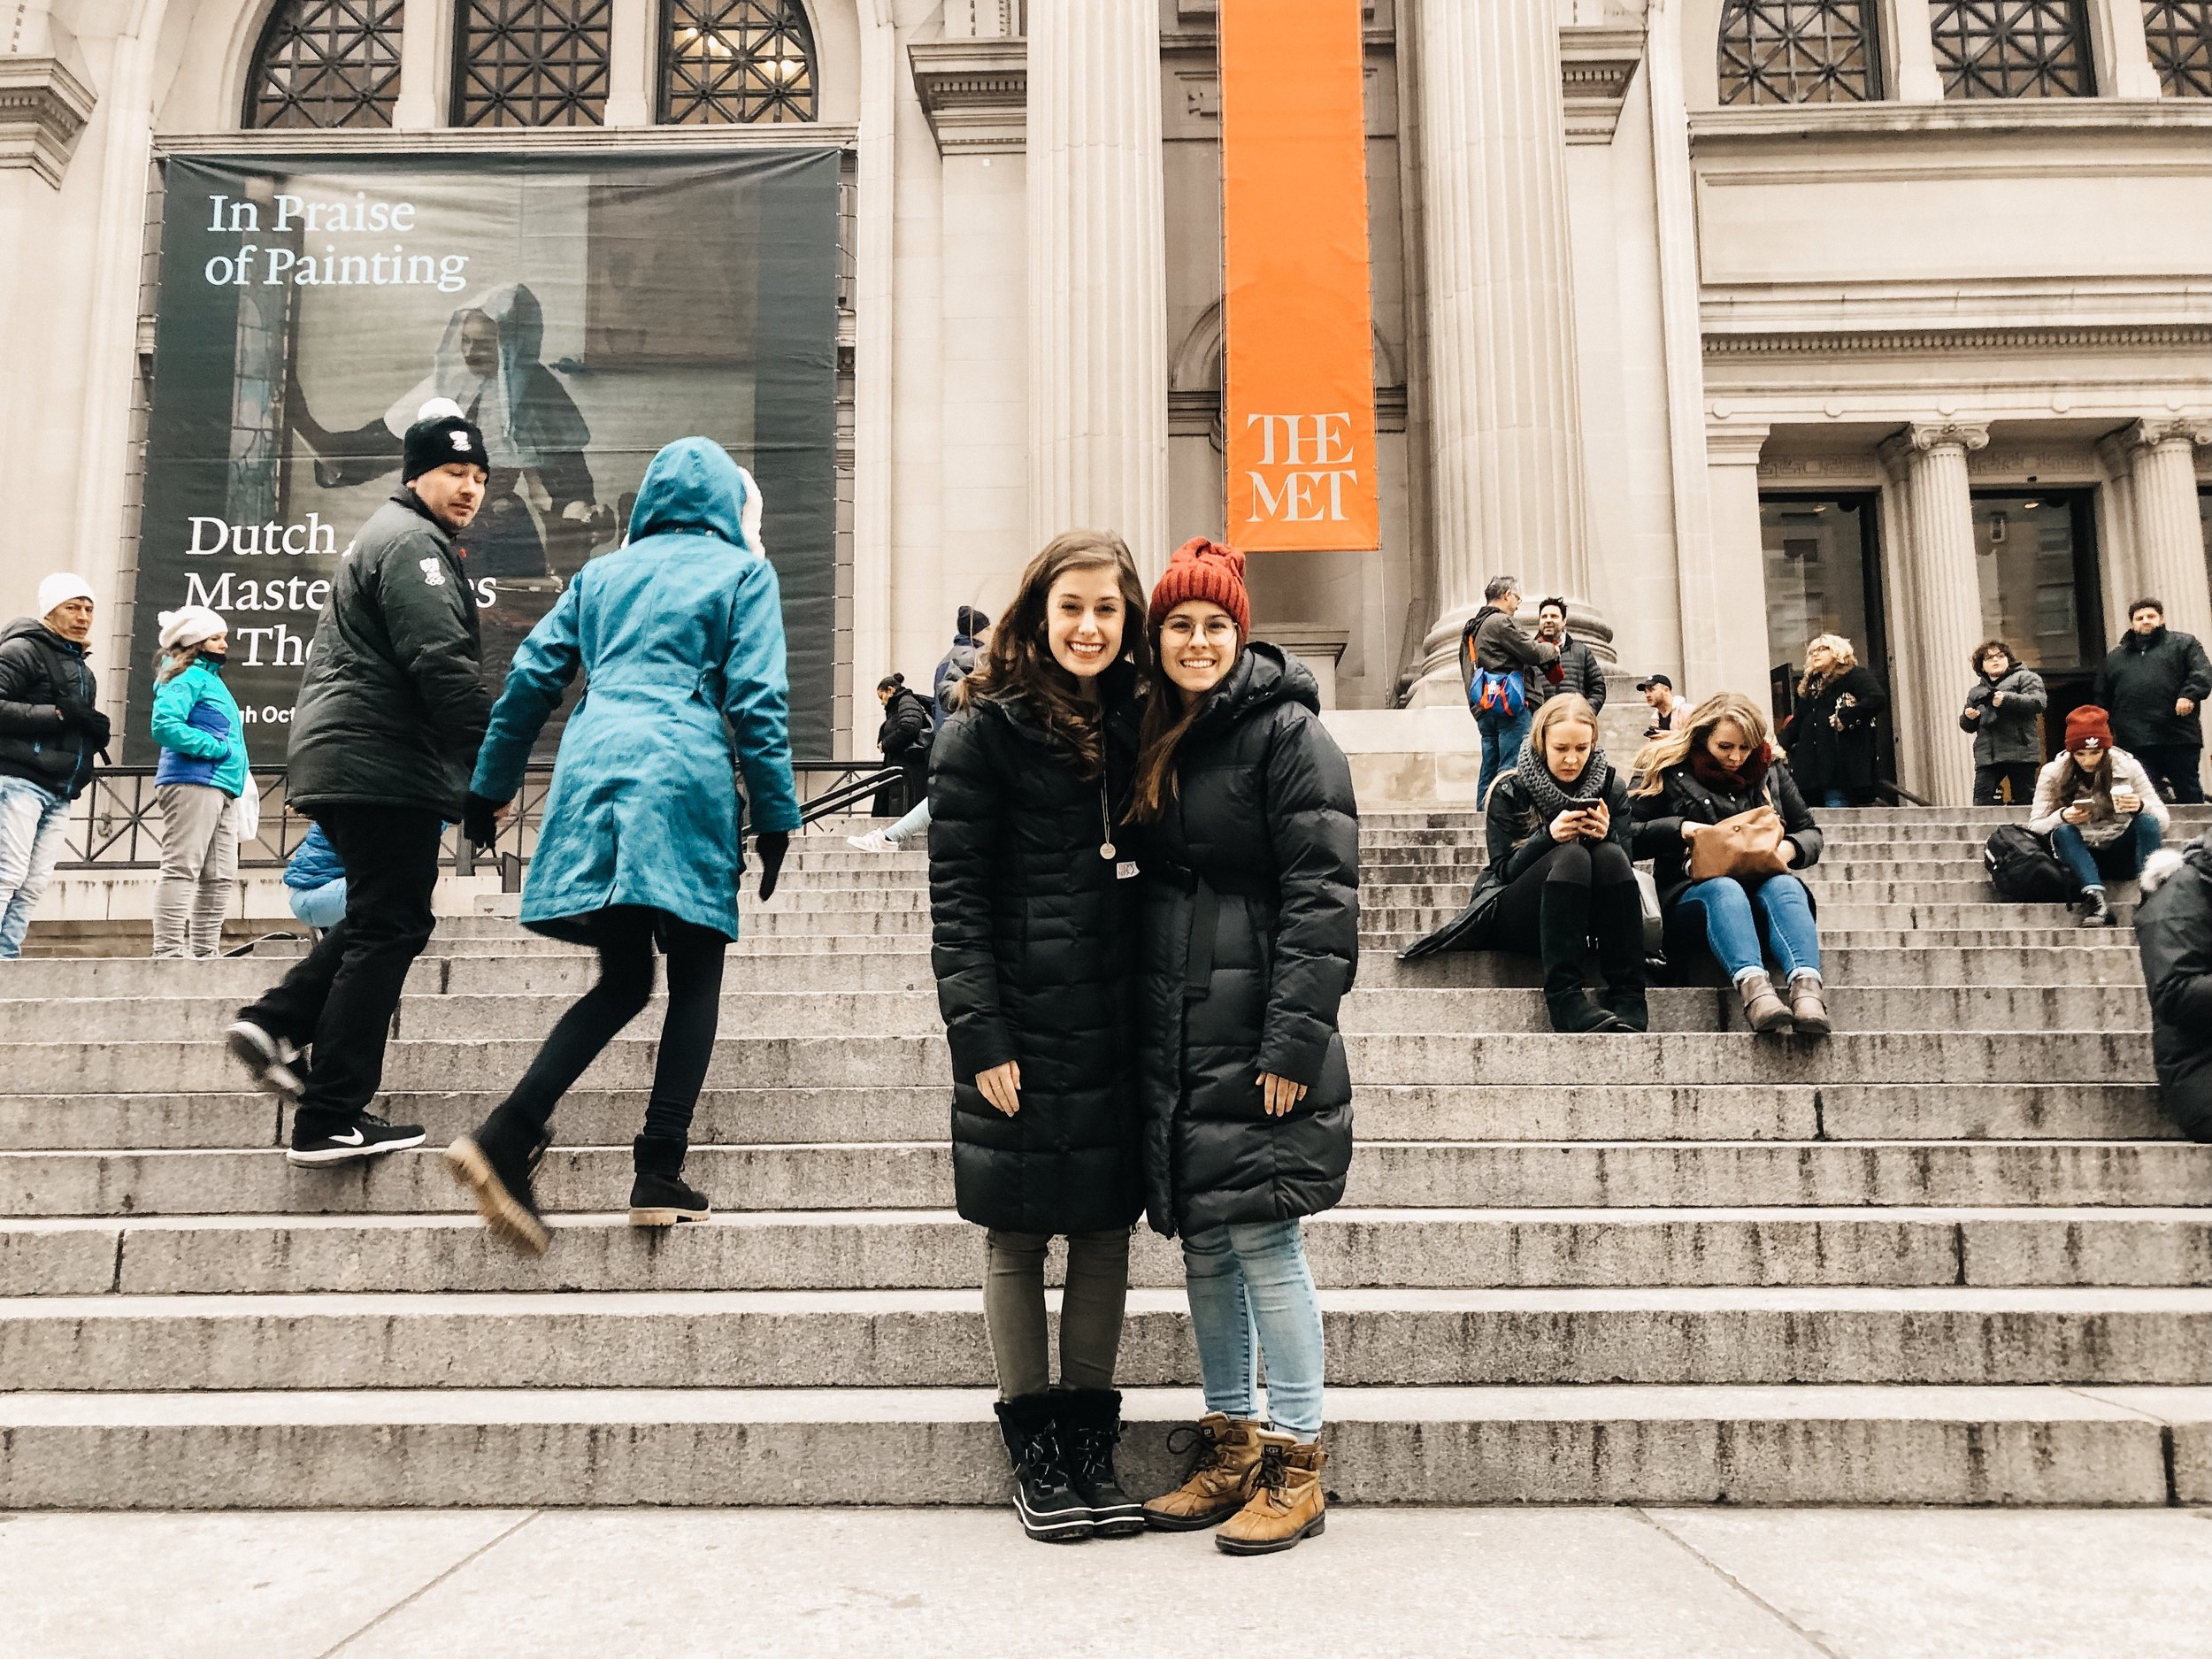 The Metropolitan Museum of Art, photo taken by a stranger. 2019.